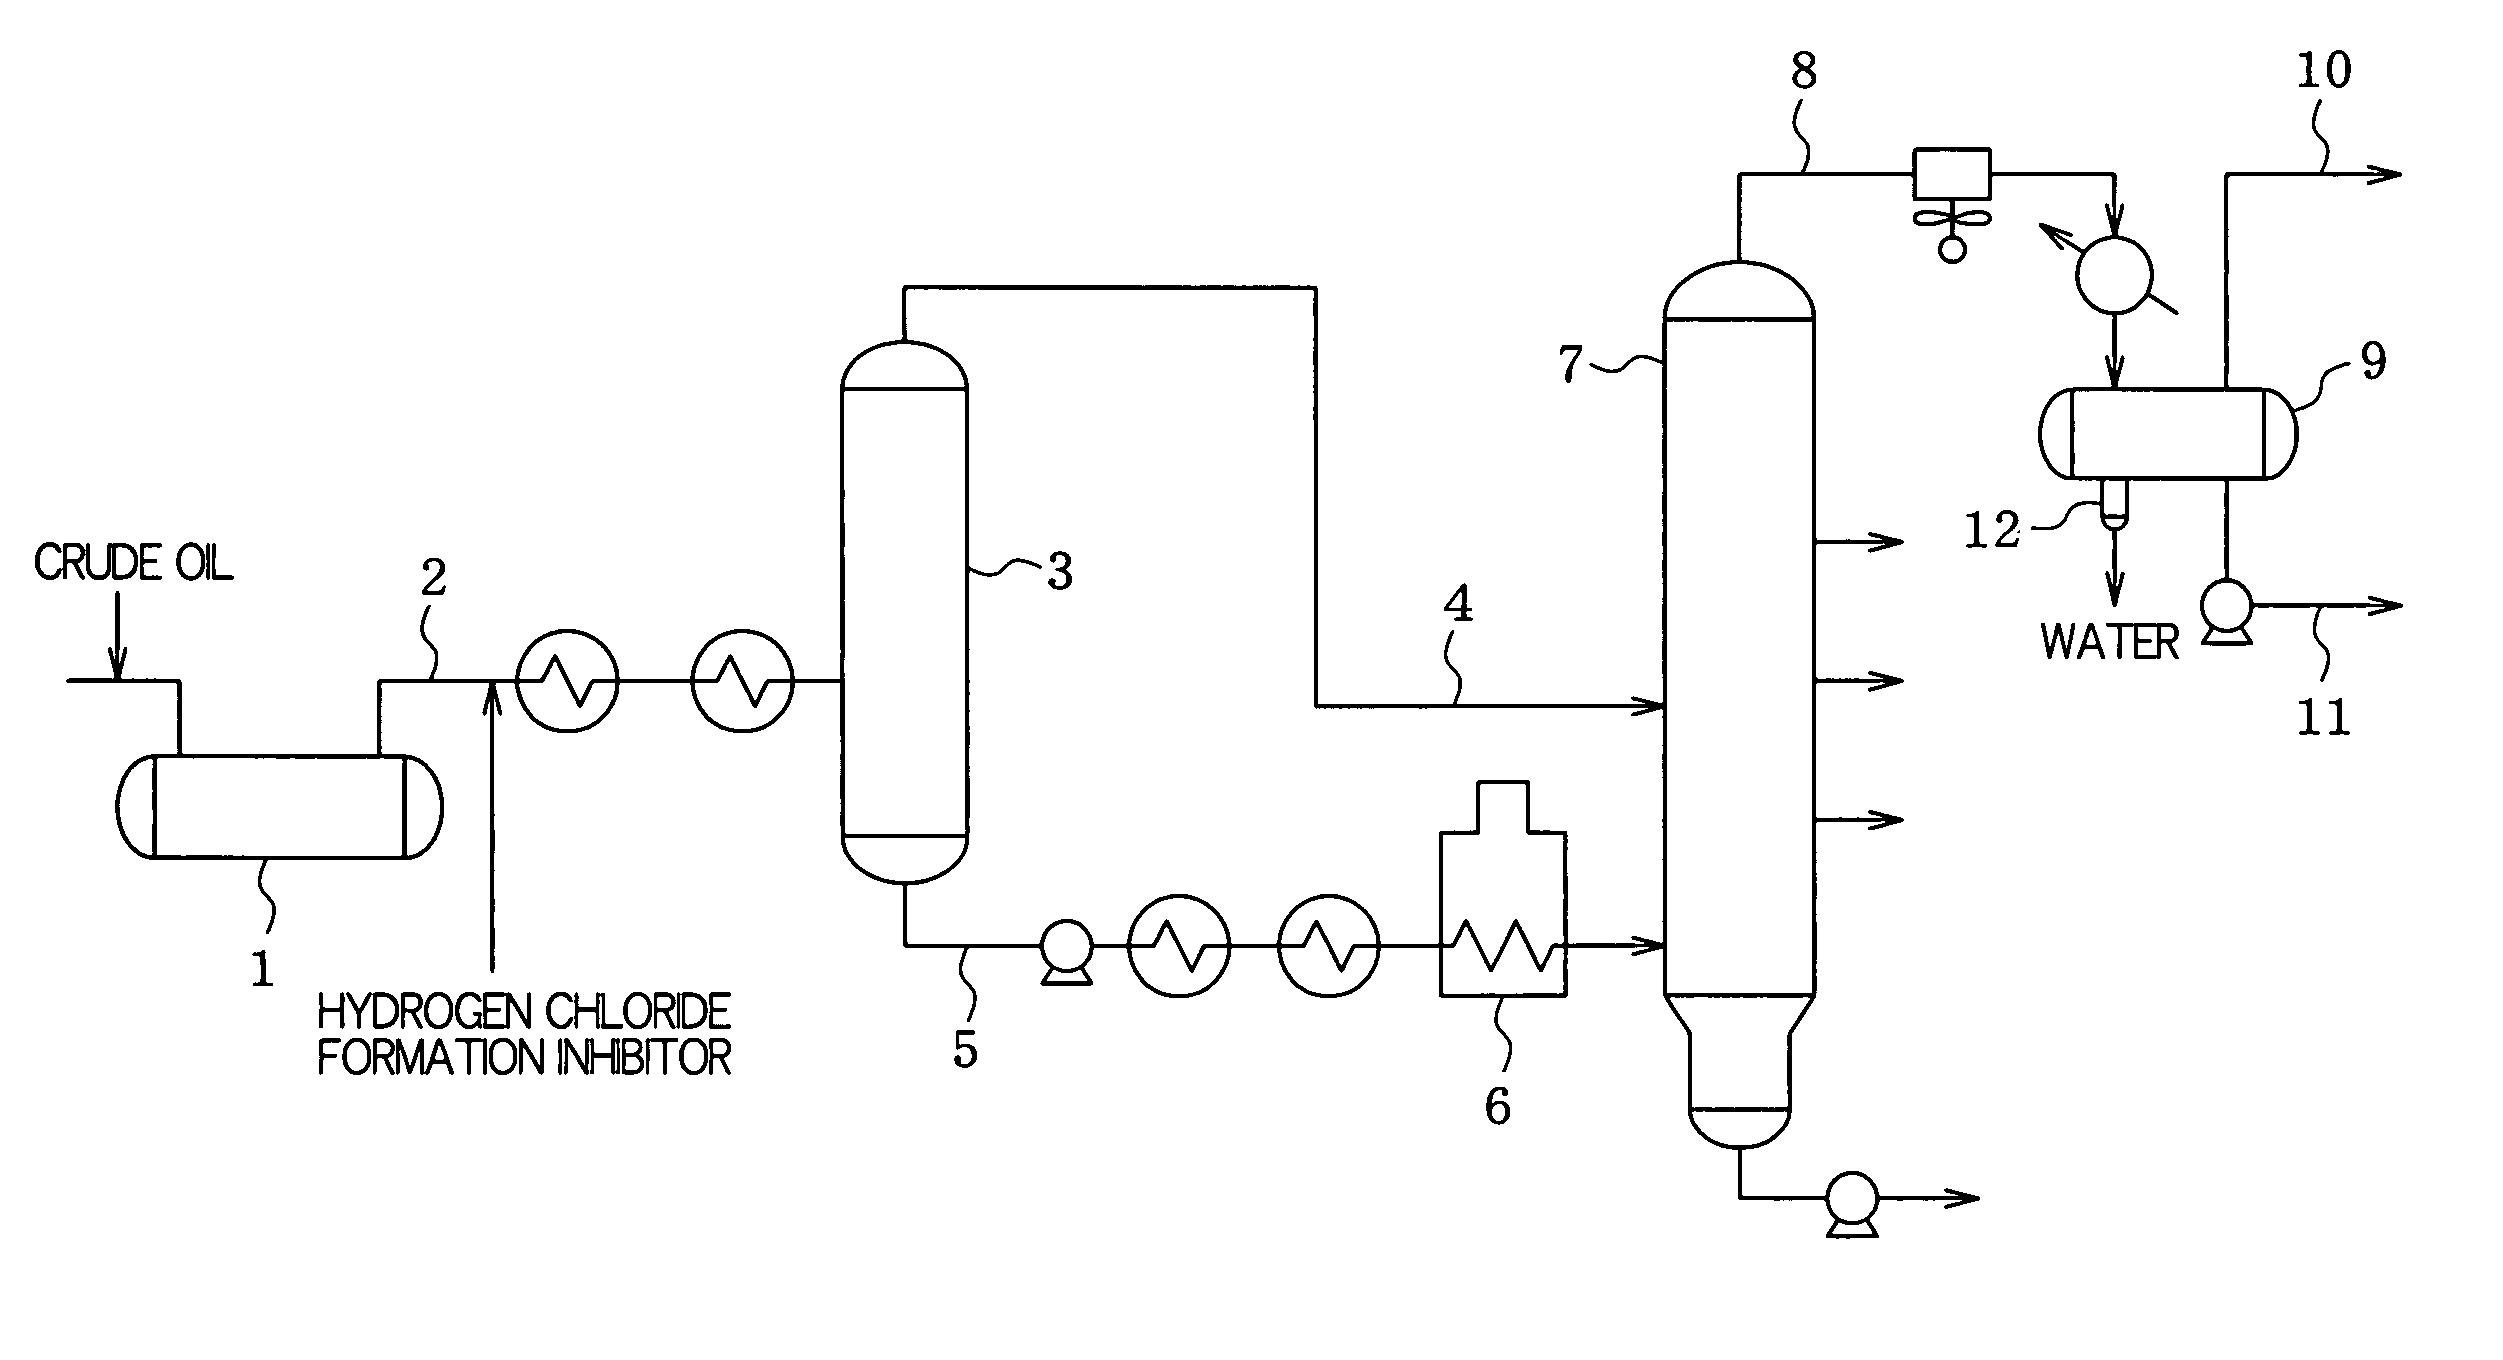 Hydrogen Chloride: Hydrogen Chloride Formation